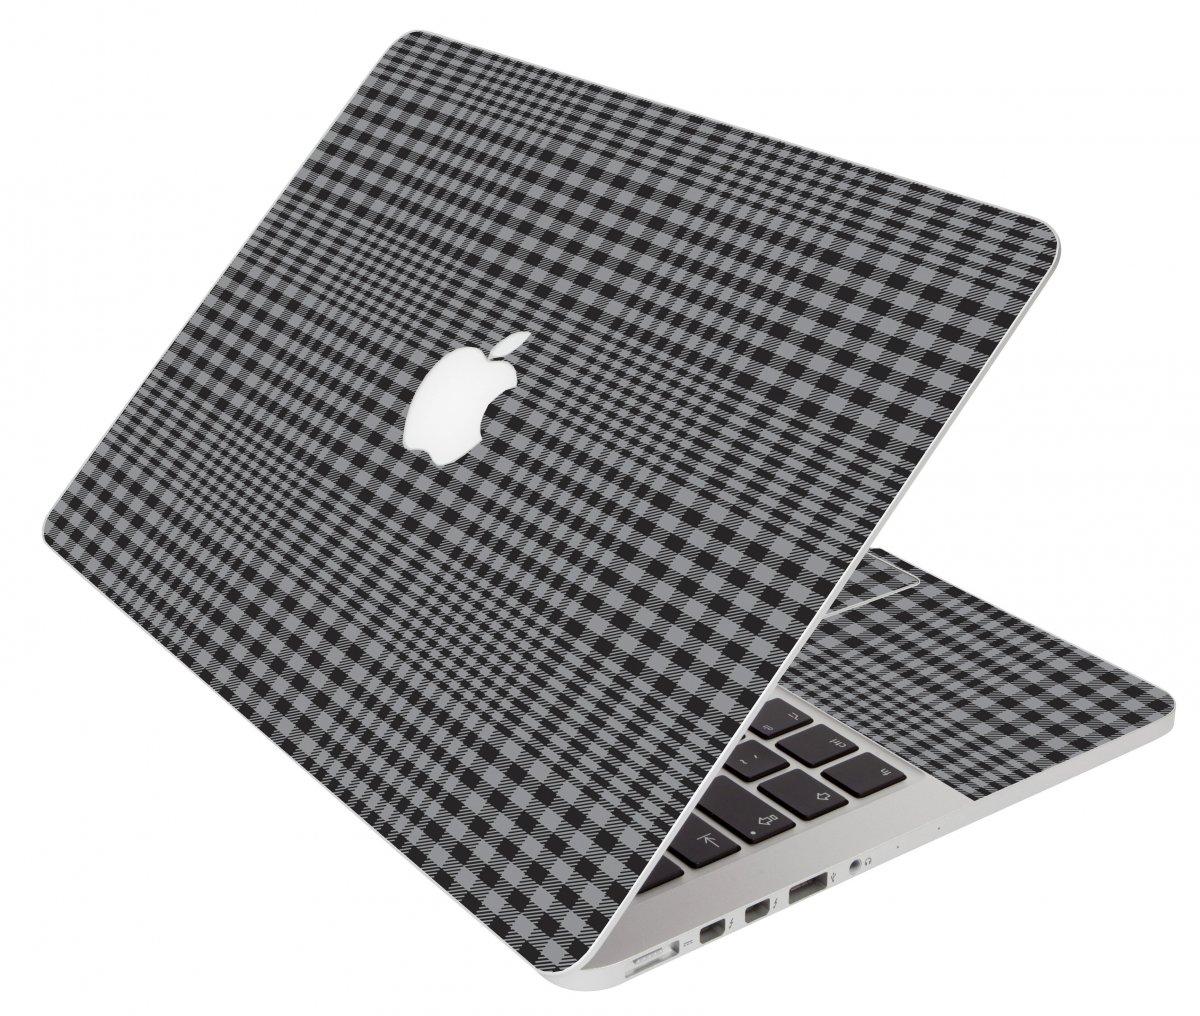 Darkest Grey Plaid Apple Macbook Air 11 A1370 Laptop Skin